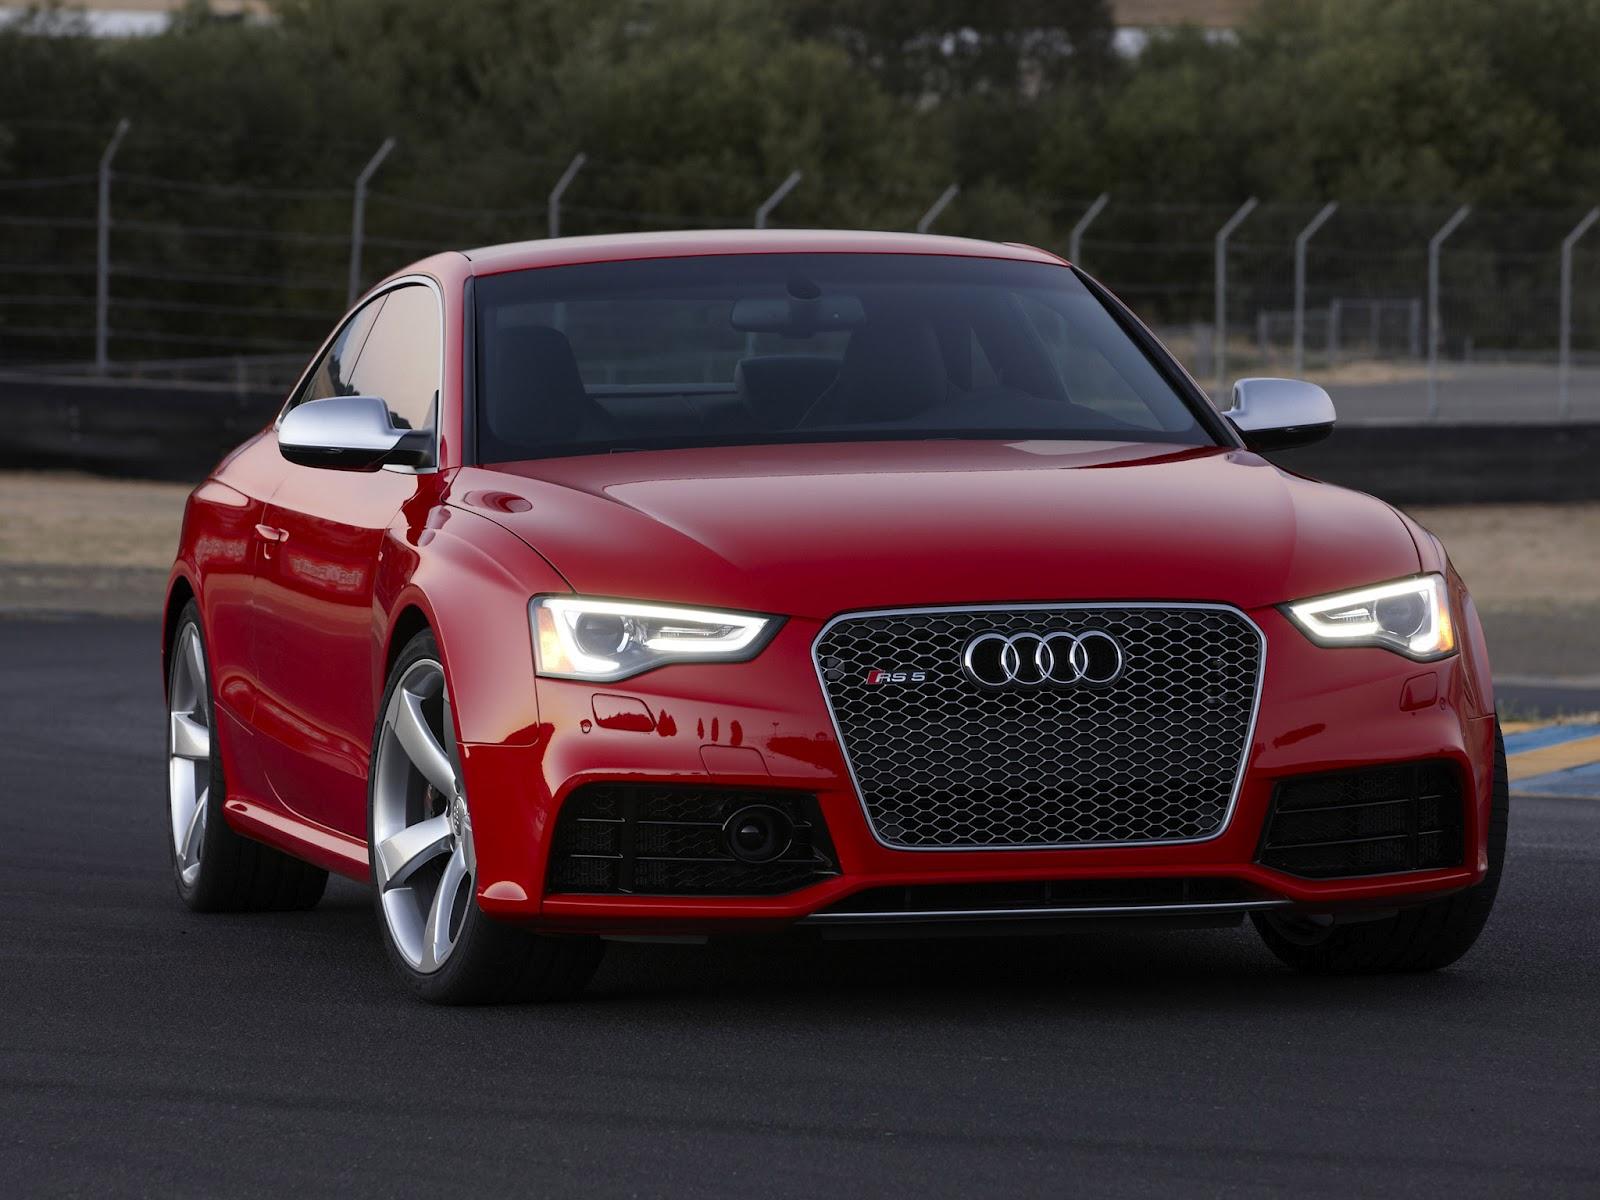 Kelebihan Audi Rs5 2013 Top Model Tahun Ini